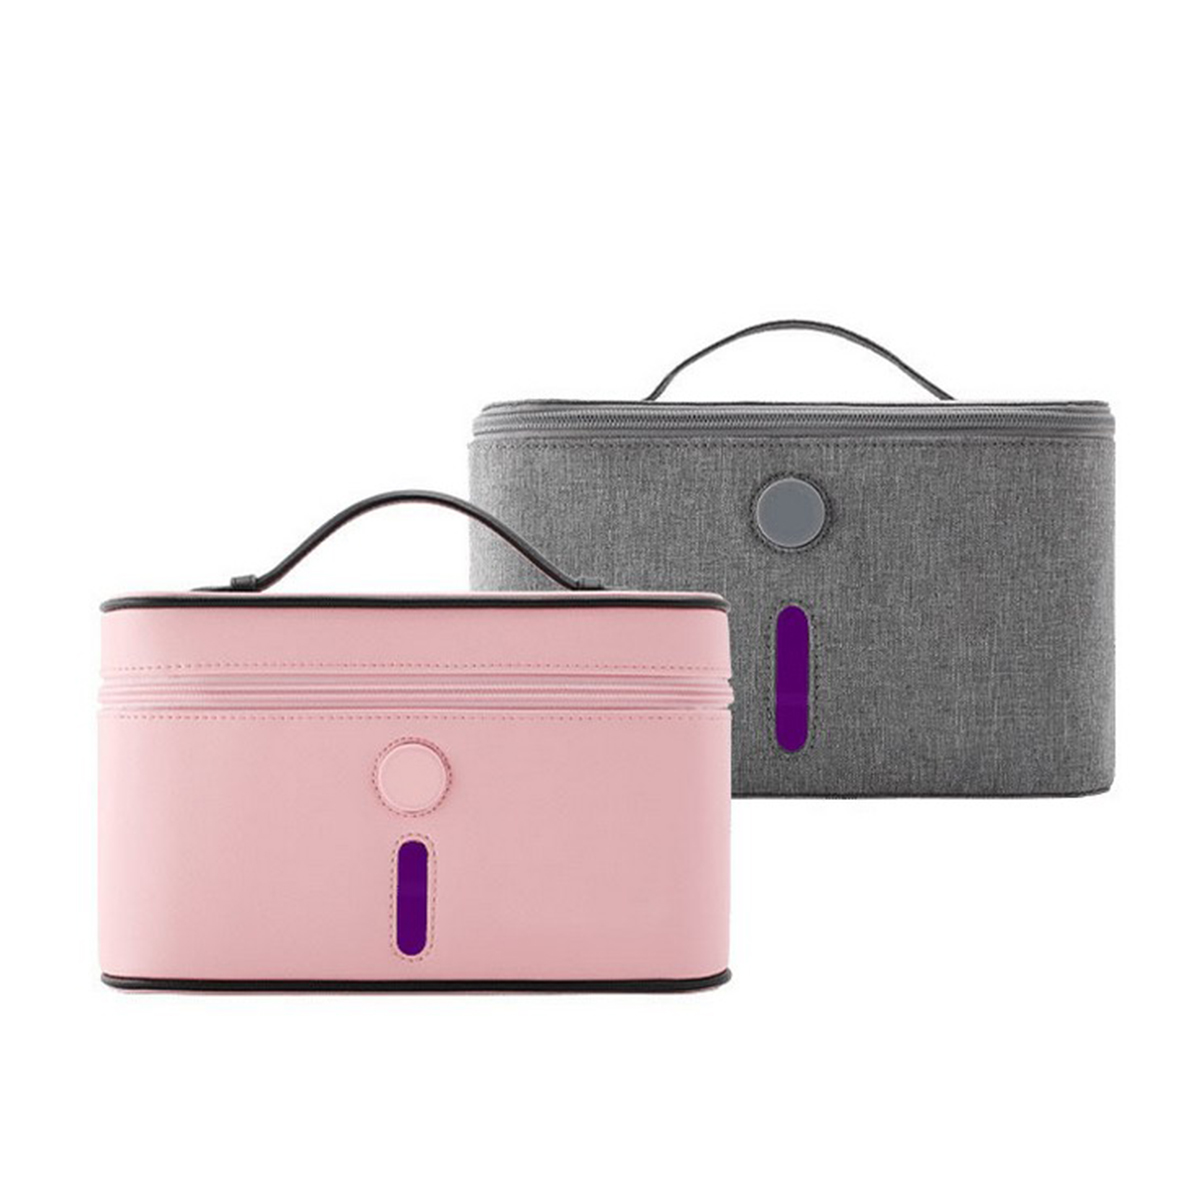 Led Sterilization Box 13 Lamp UVC Deep UV Disinfection Box UVC Disinfection Bag Sanitizer Kills 99.9% Of Germs